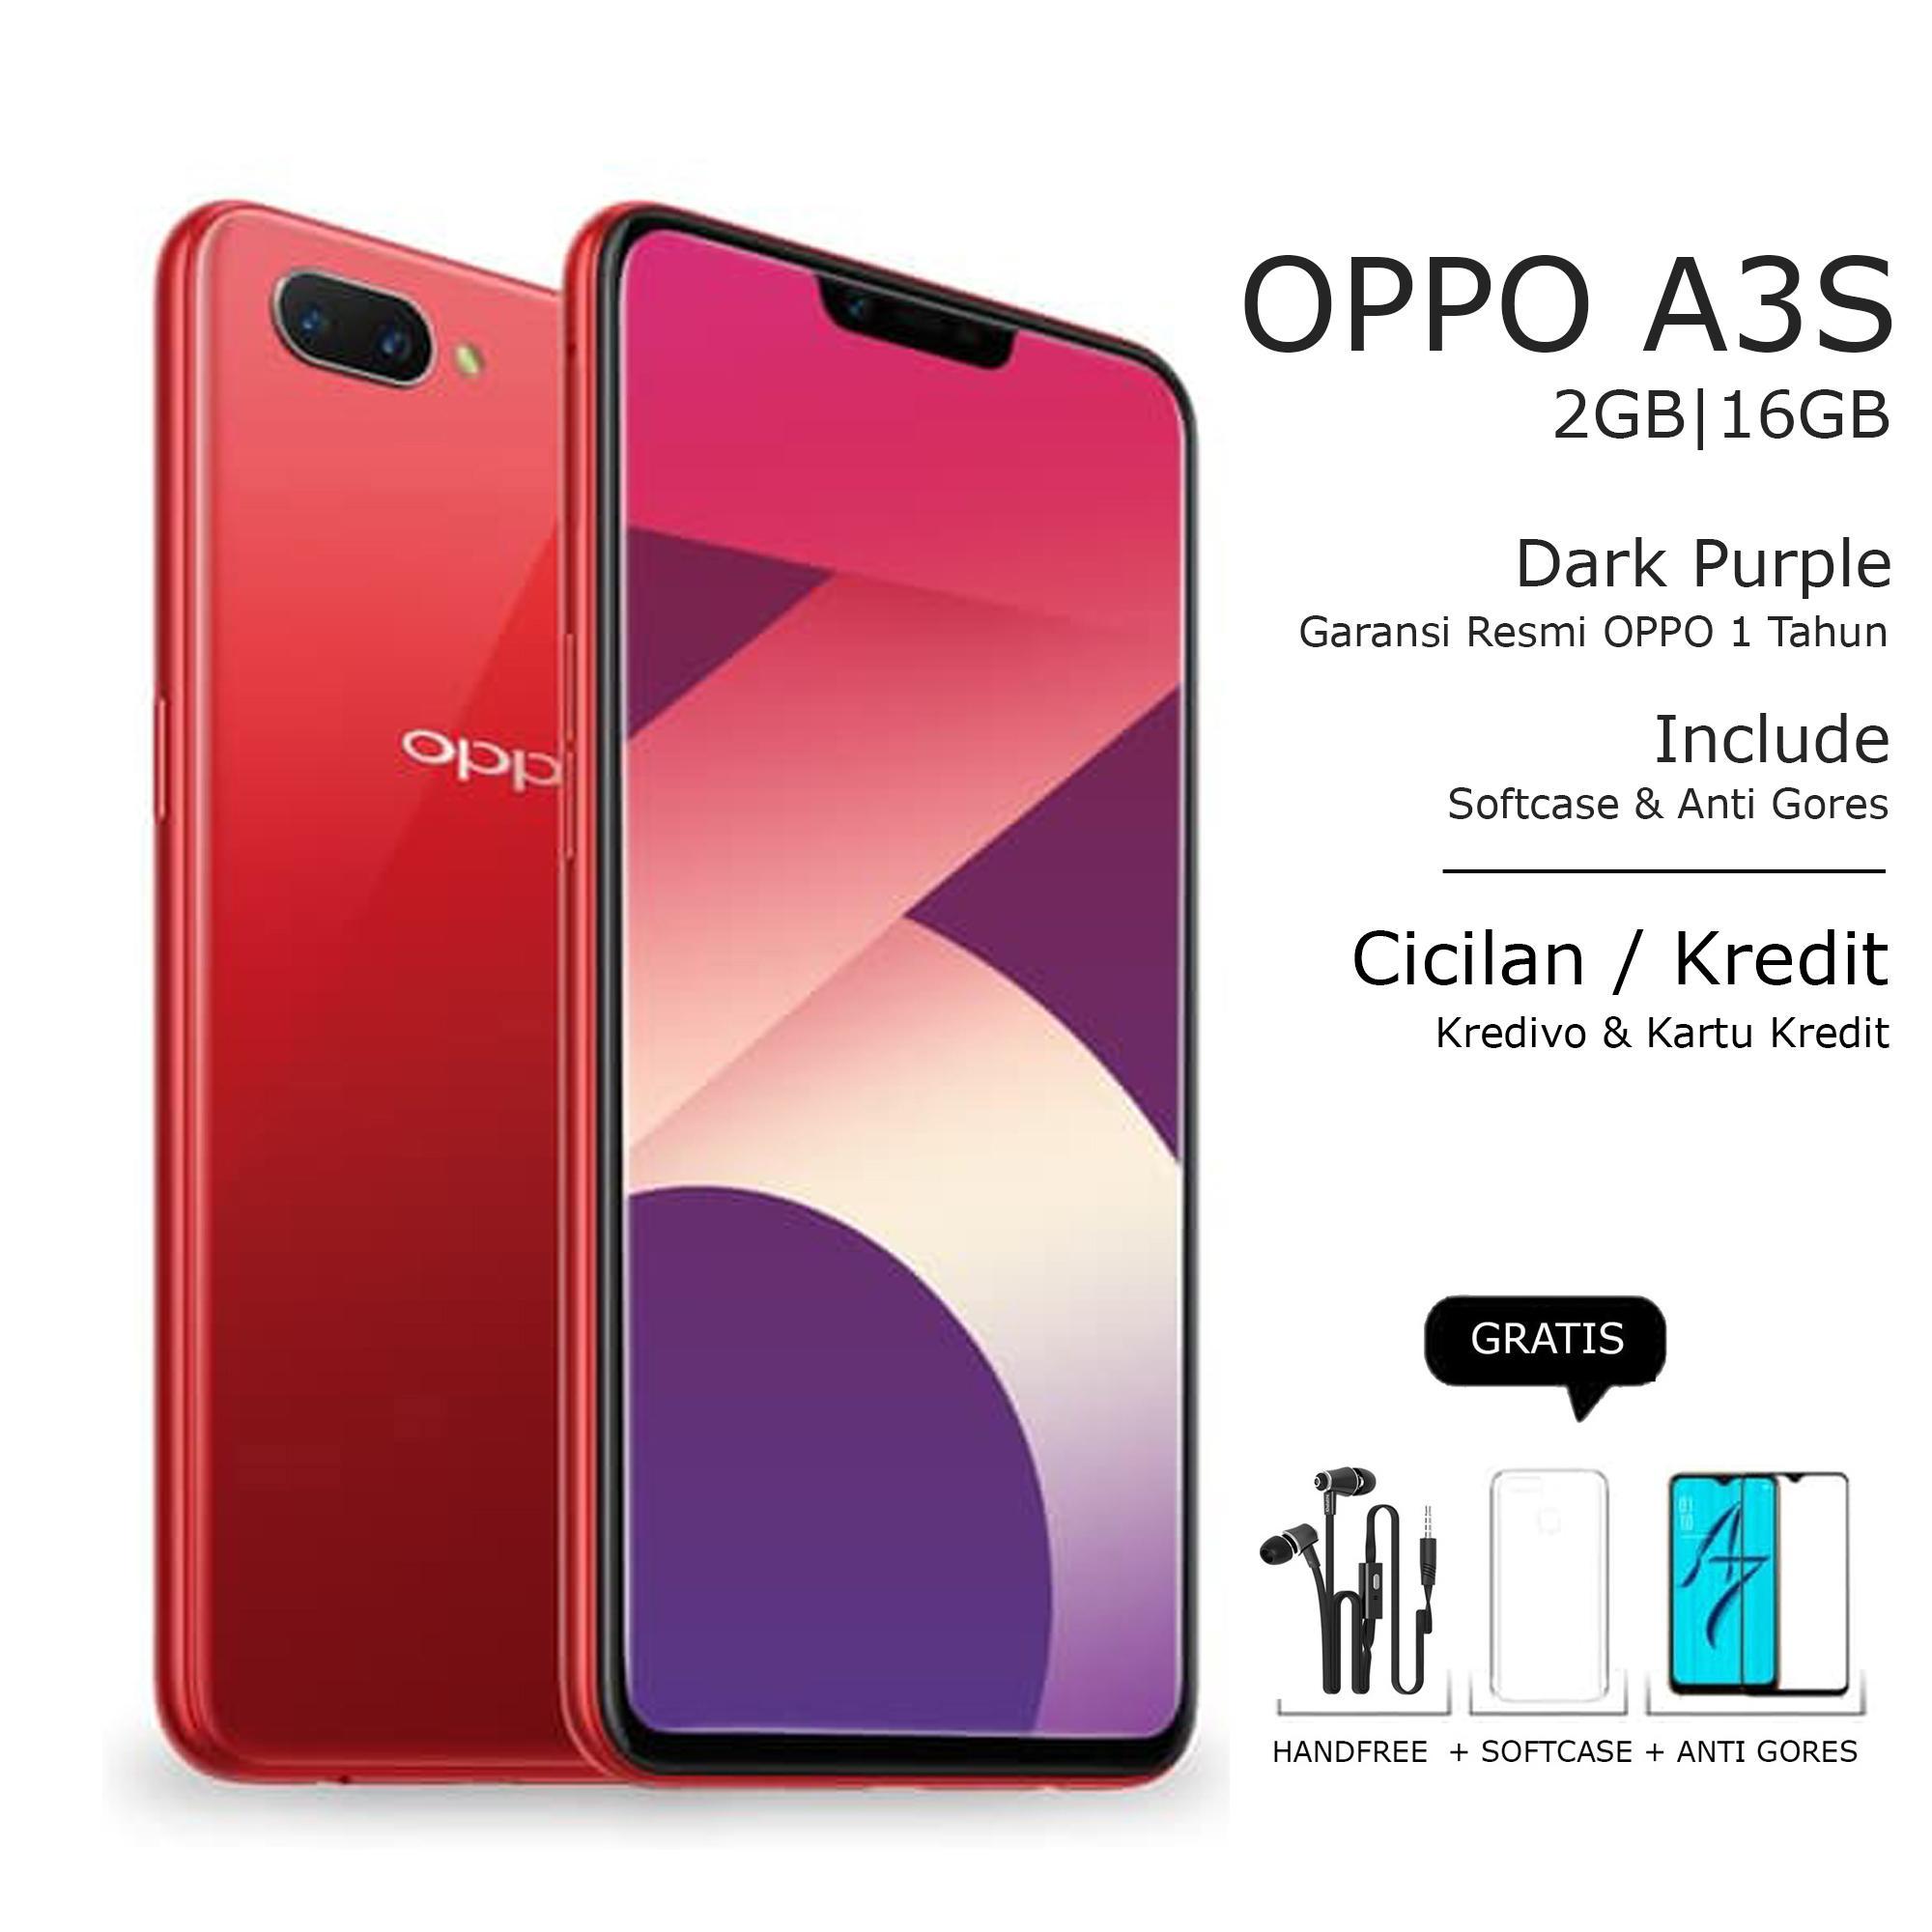 OPPO A3S 2/16GB - 4G LTE - LAYAR 6.2 INCH - GARANSI RESMI